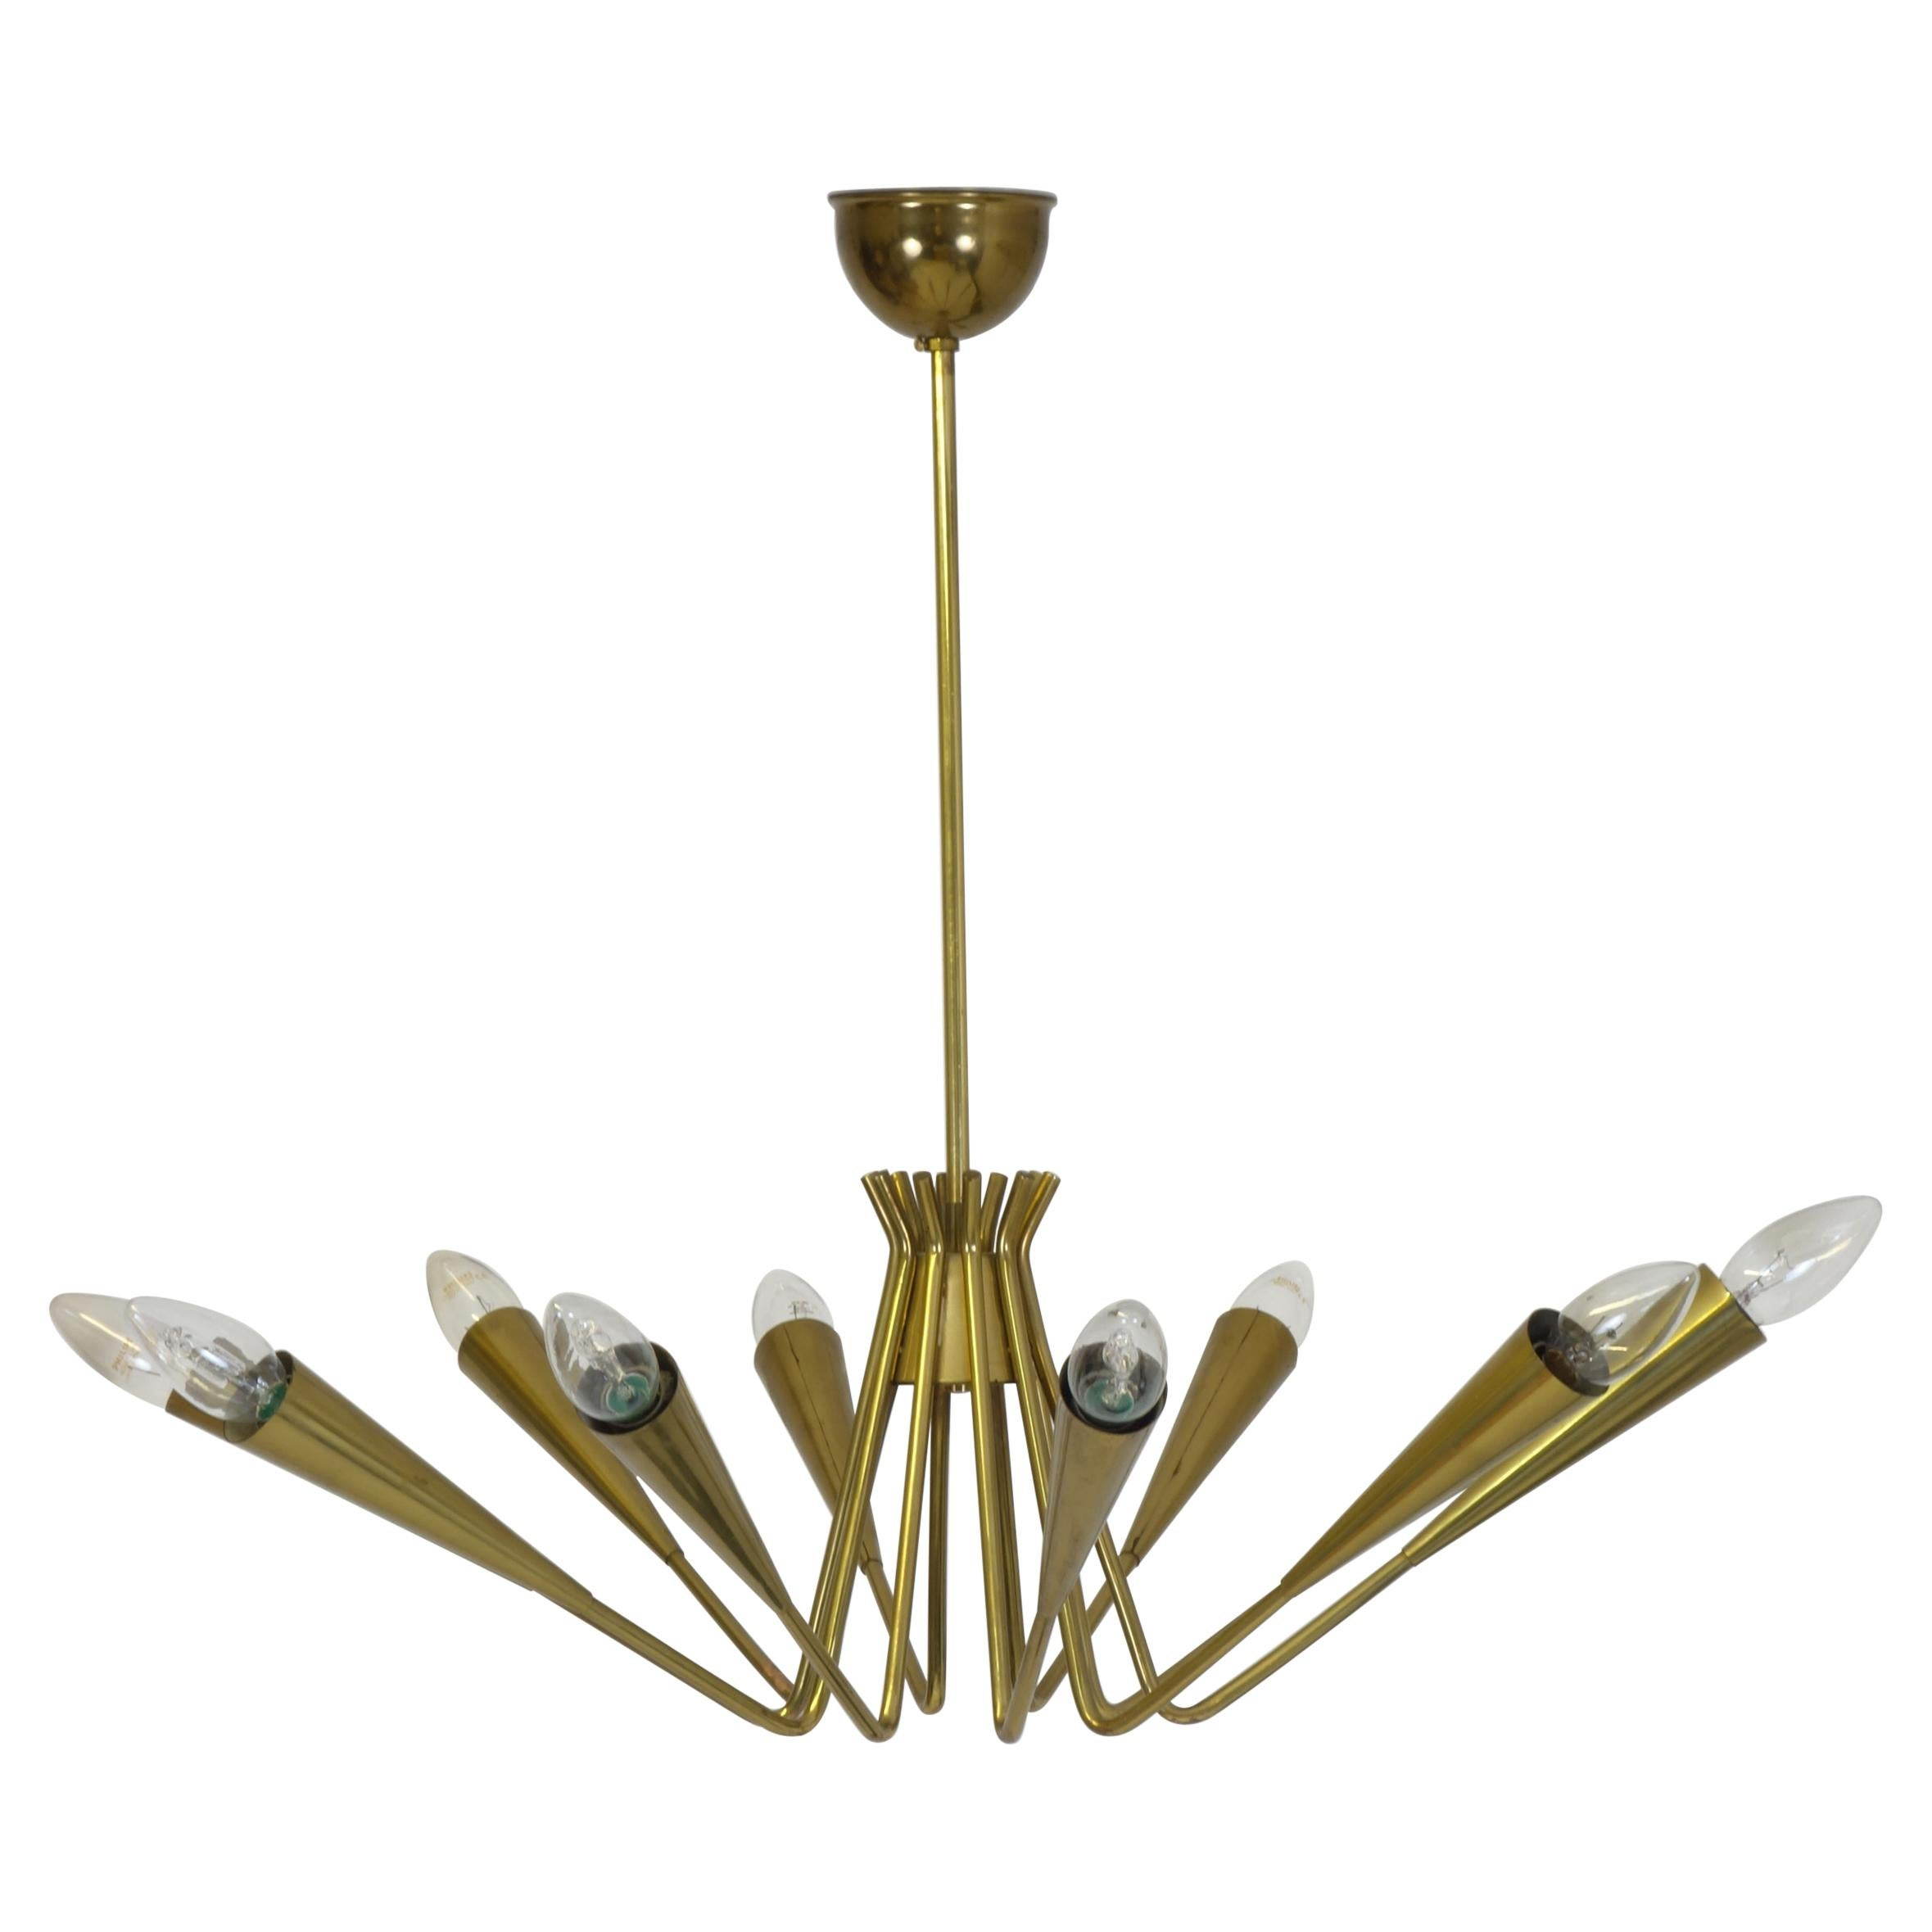 Large Chandelier or Pendant Brass in the Manner of Design Stilnovo, Italy 1950s